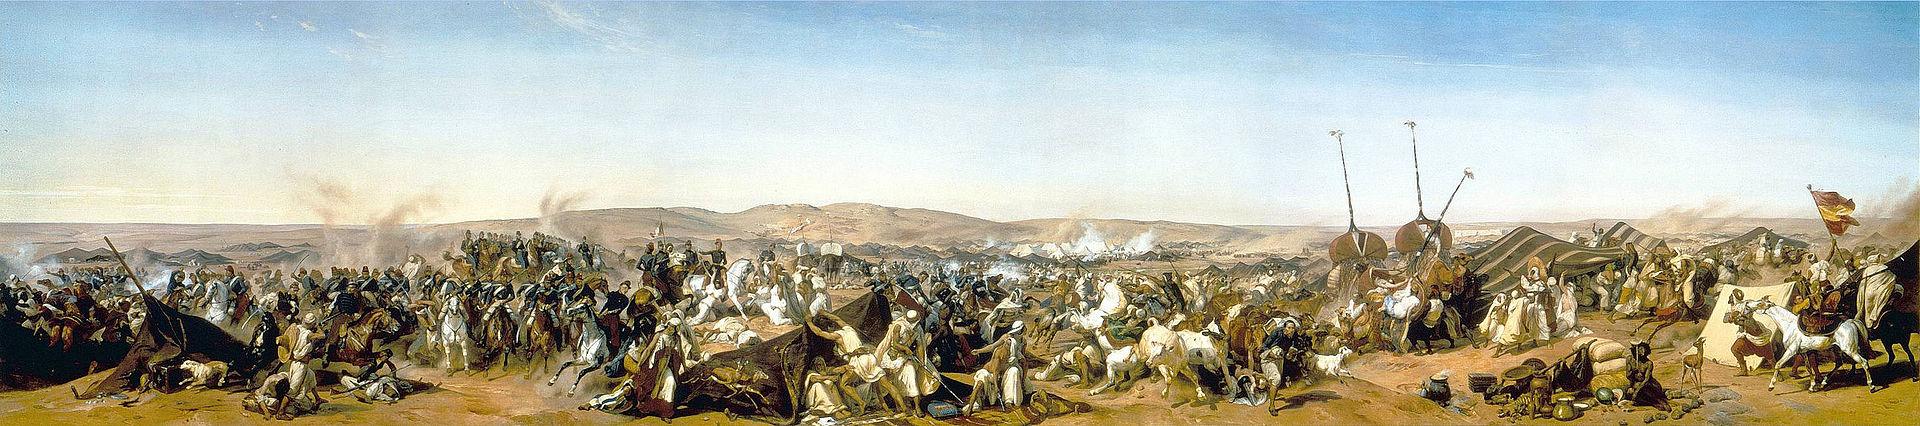 Prise_de_la_smalah_d_Abd-El-Kader_a_Taguin_16_mai_1843_Horace_Vernet (1)